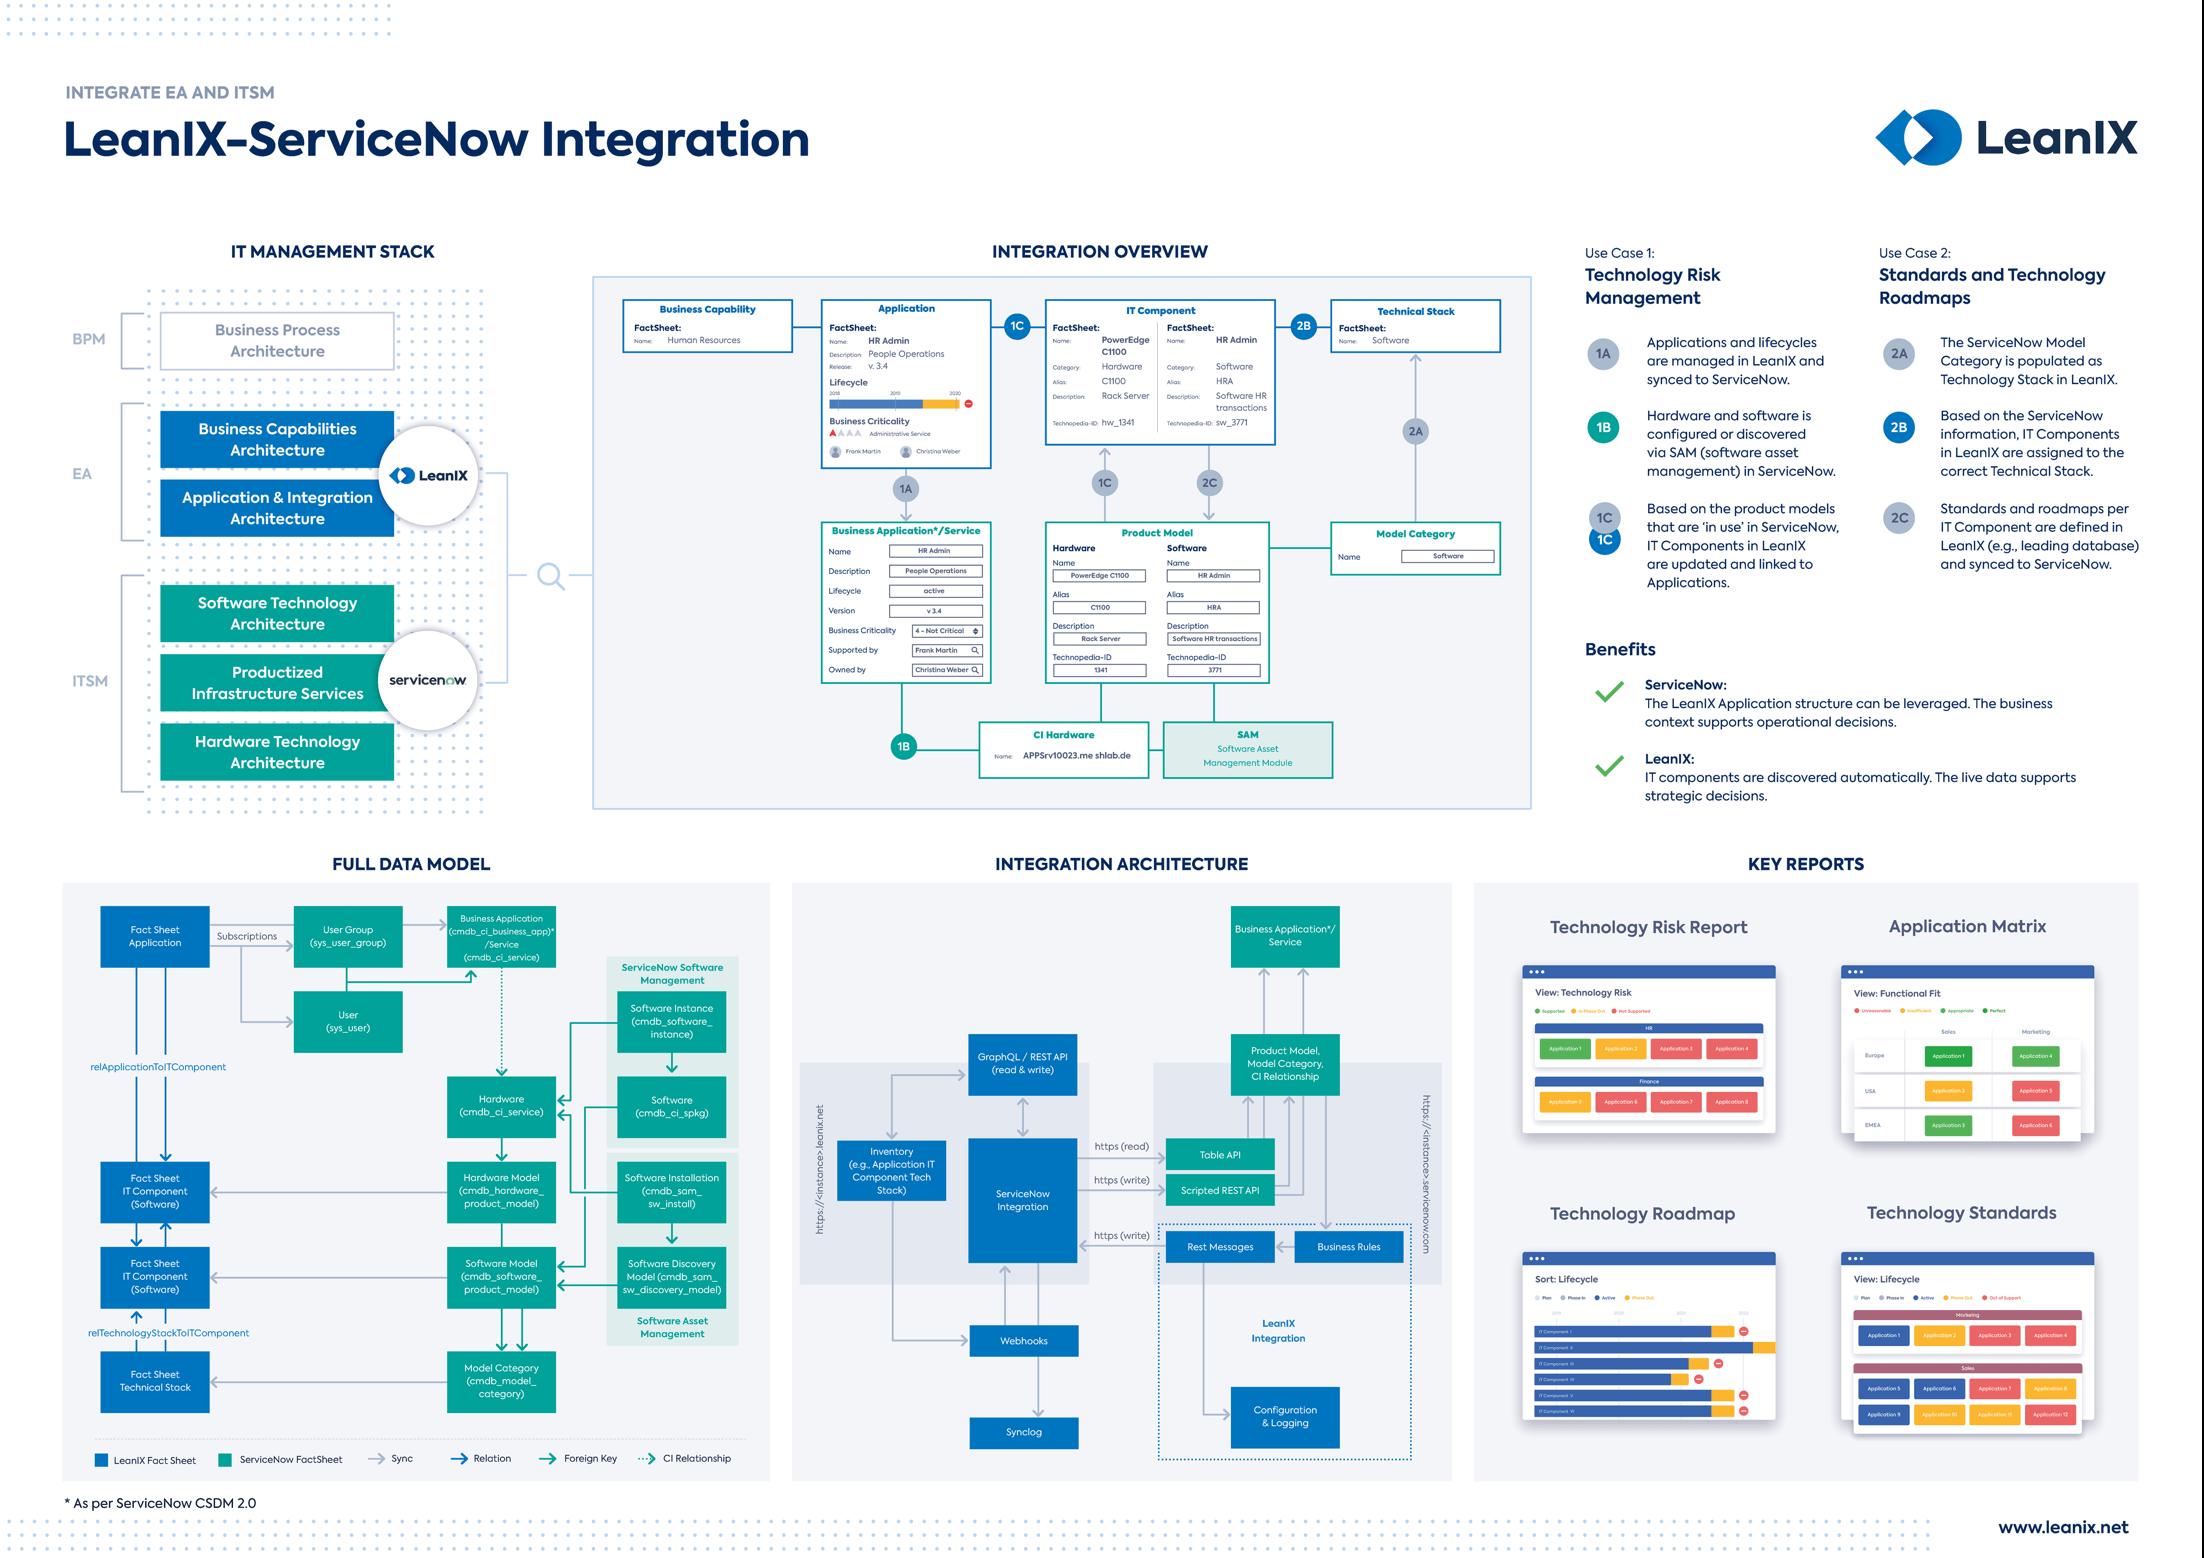 leanix-servicenow-integration